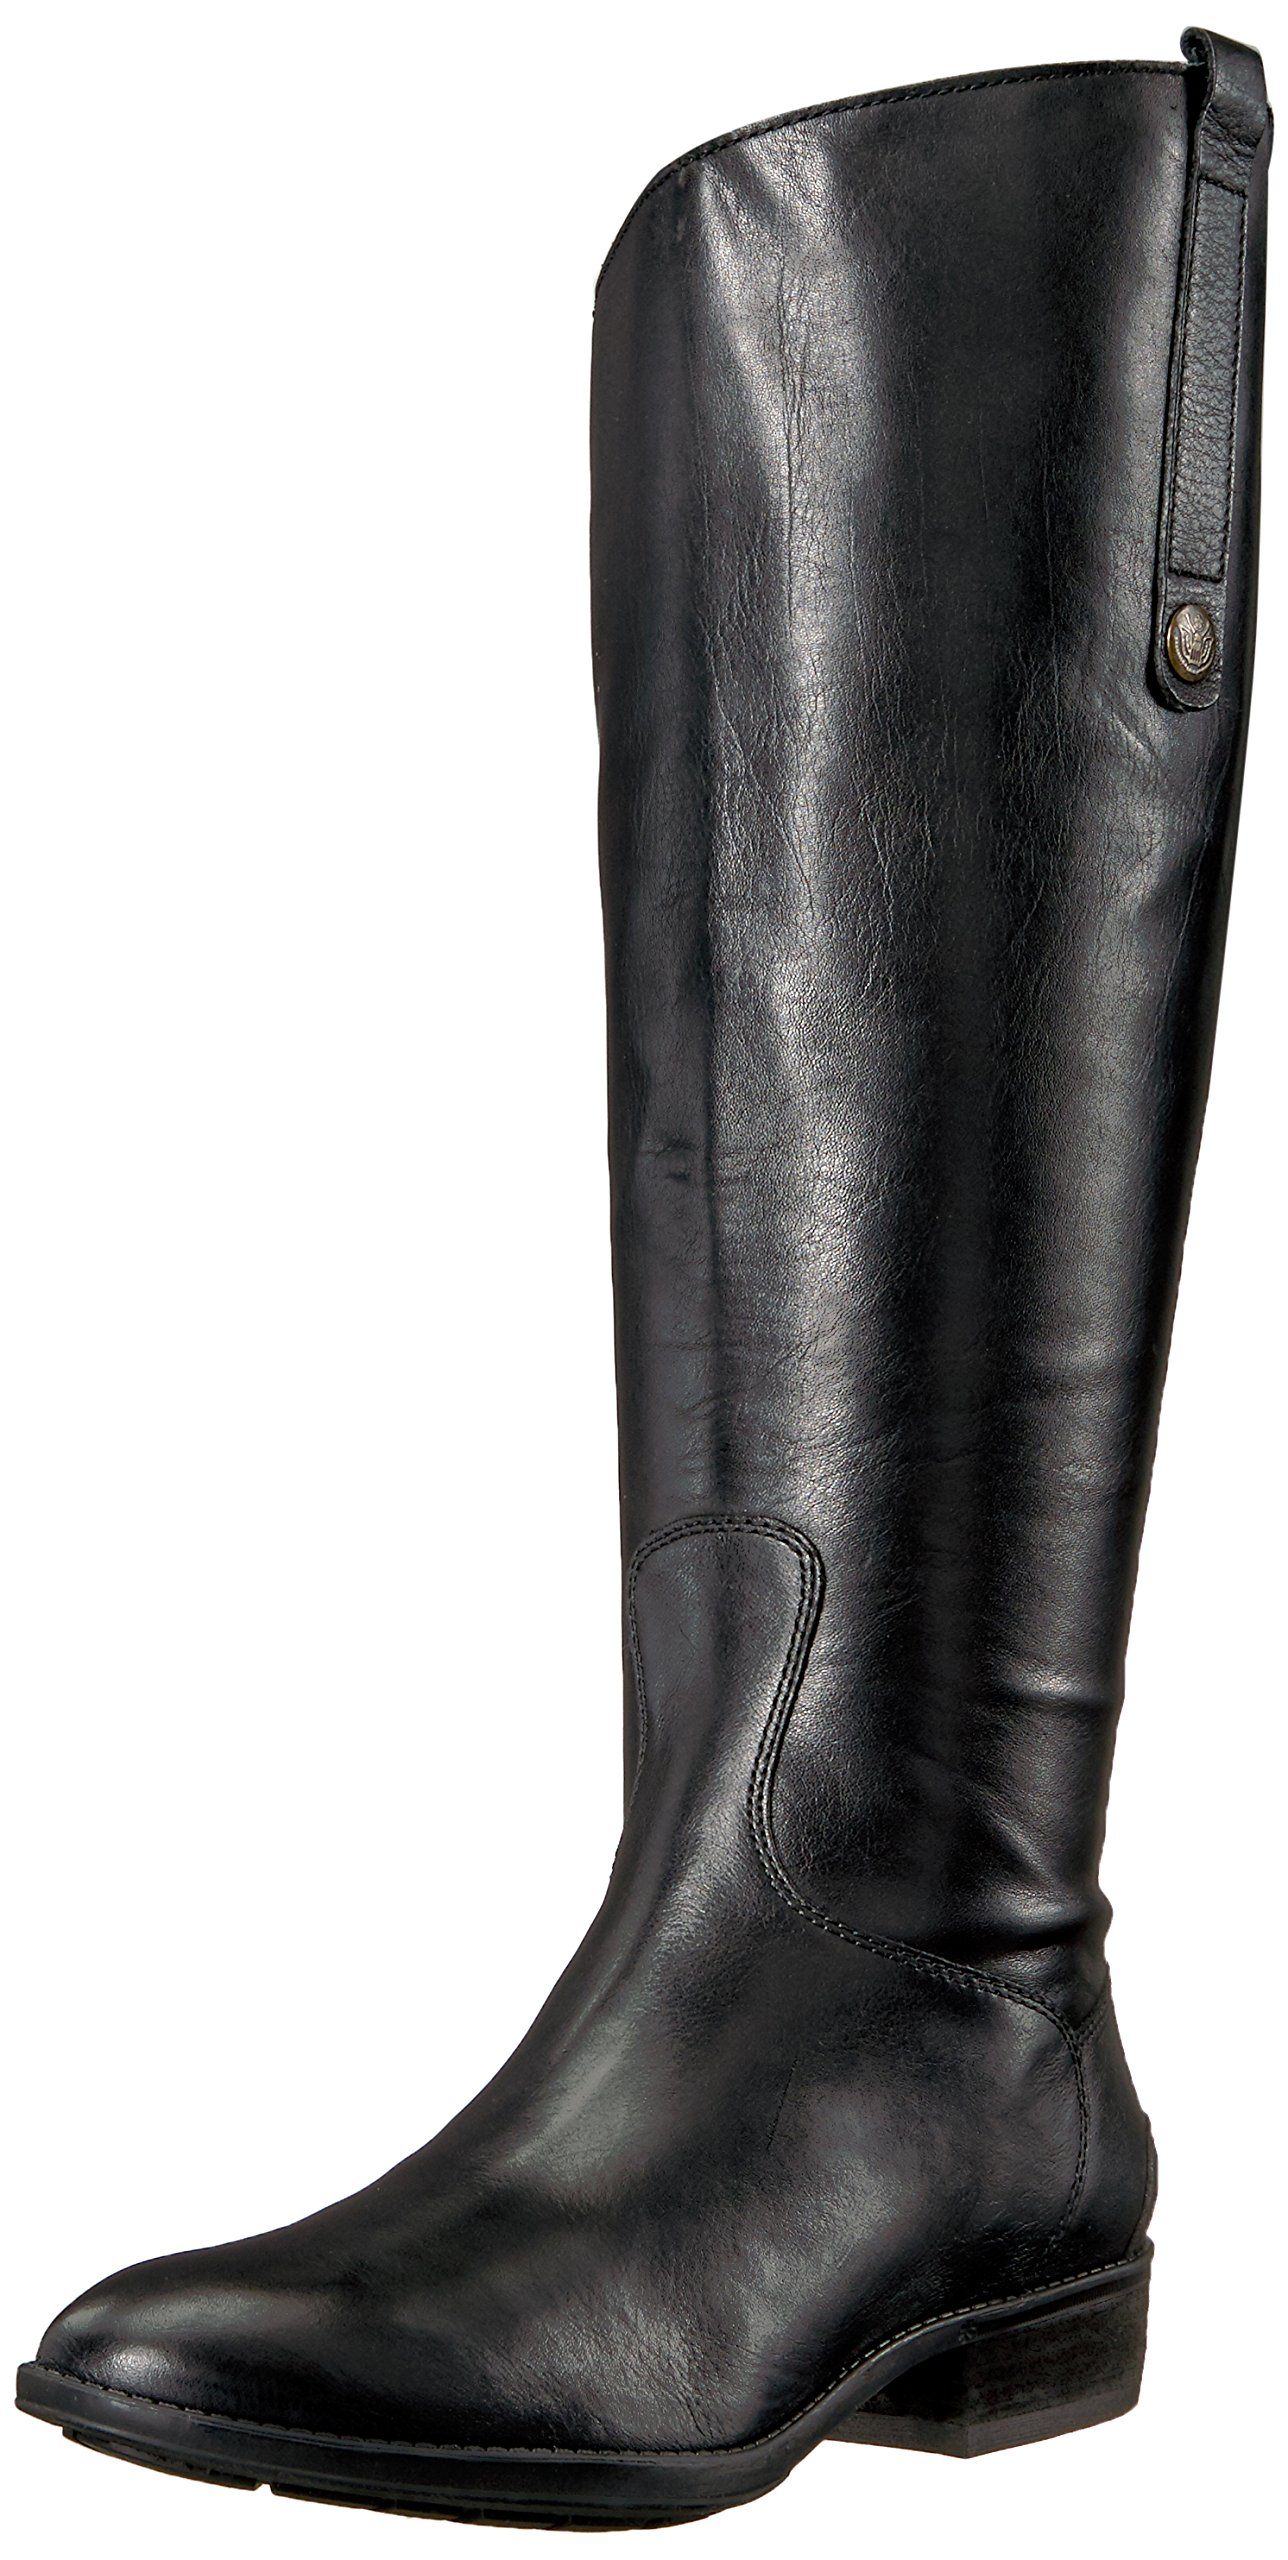 Sam Edelman Women's Penny 2 Equestrian Boot, Black Leather, 10 Wide US by Sam Edelman